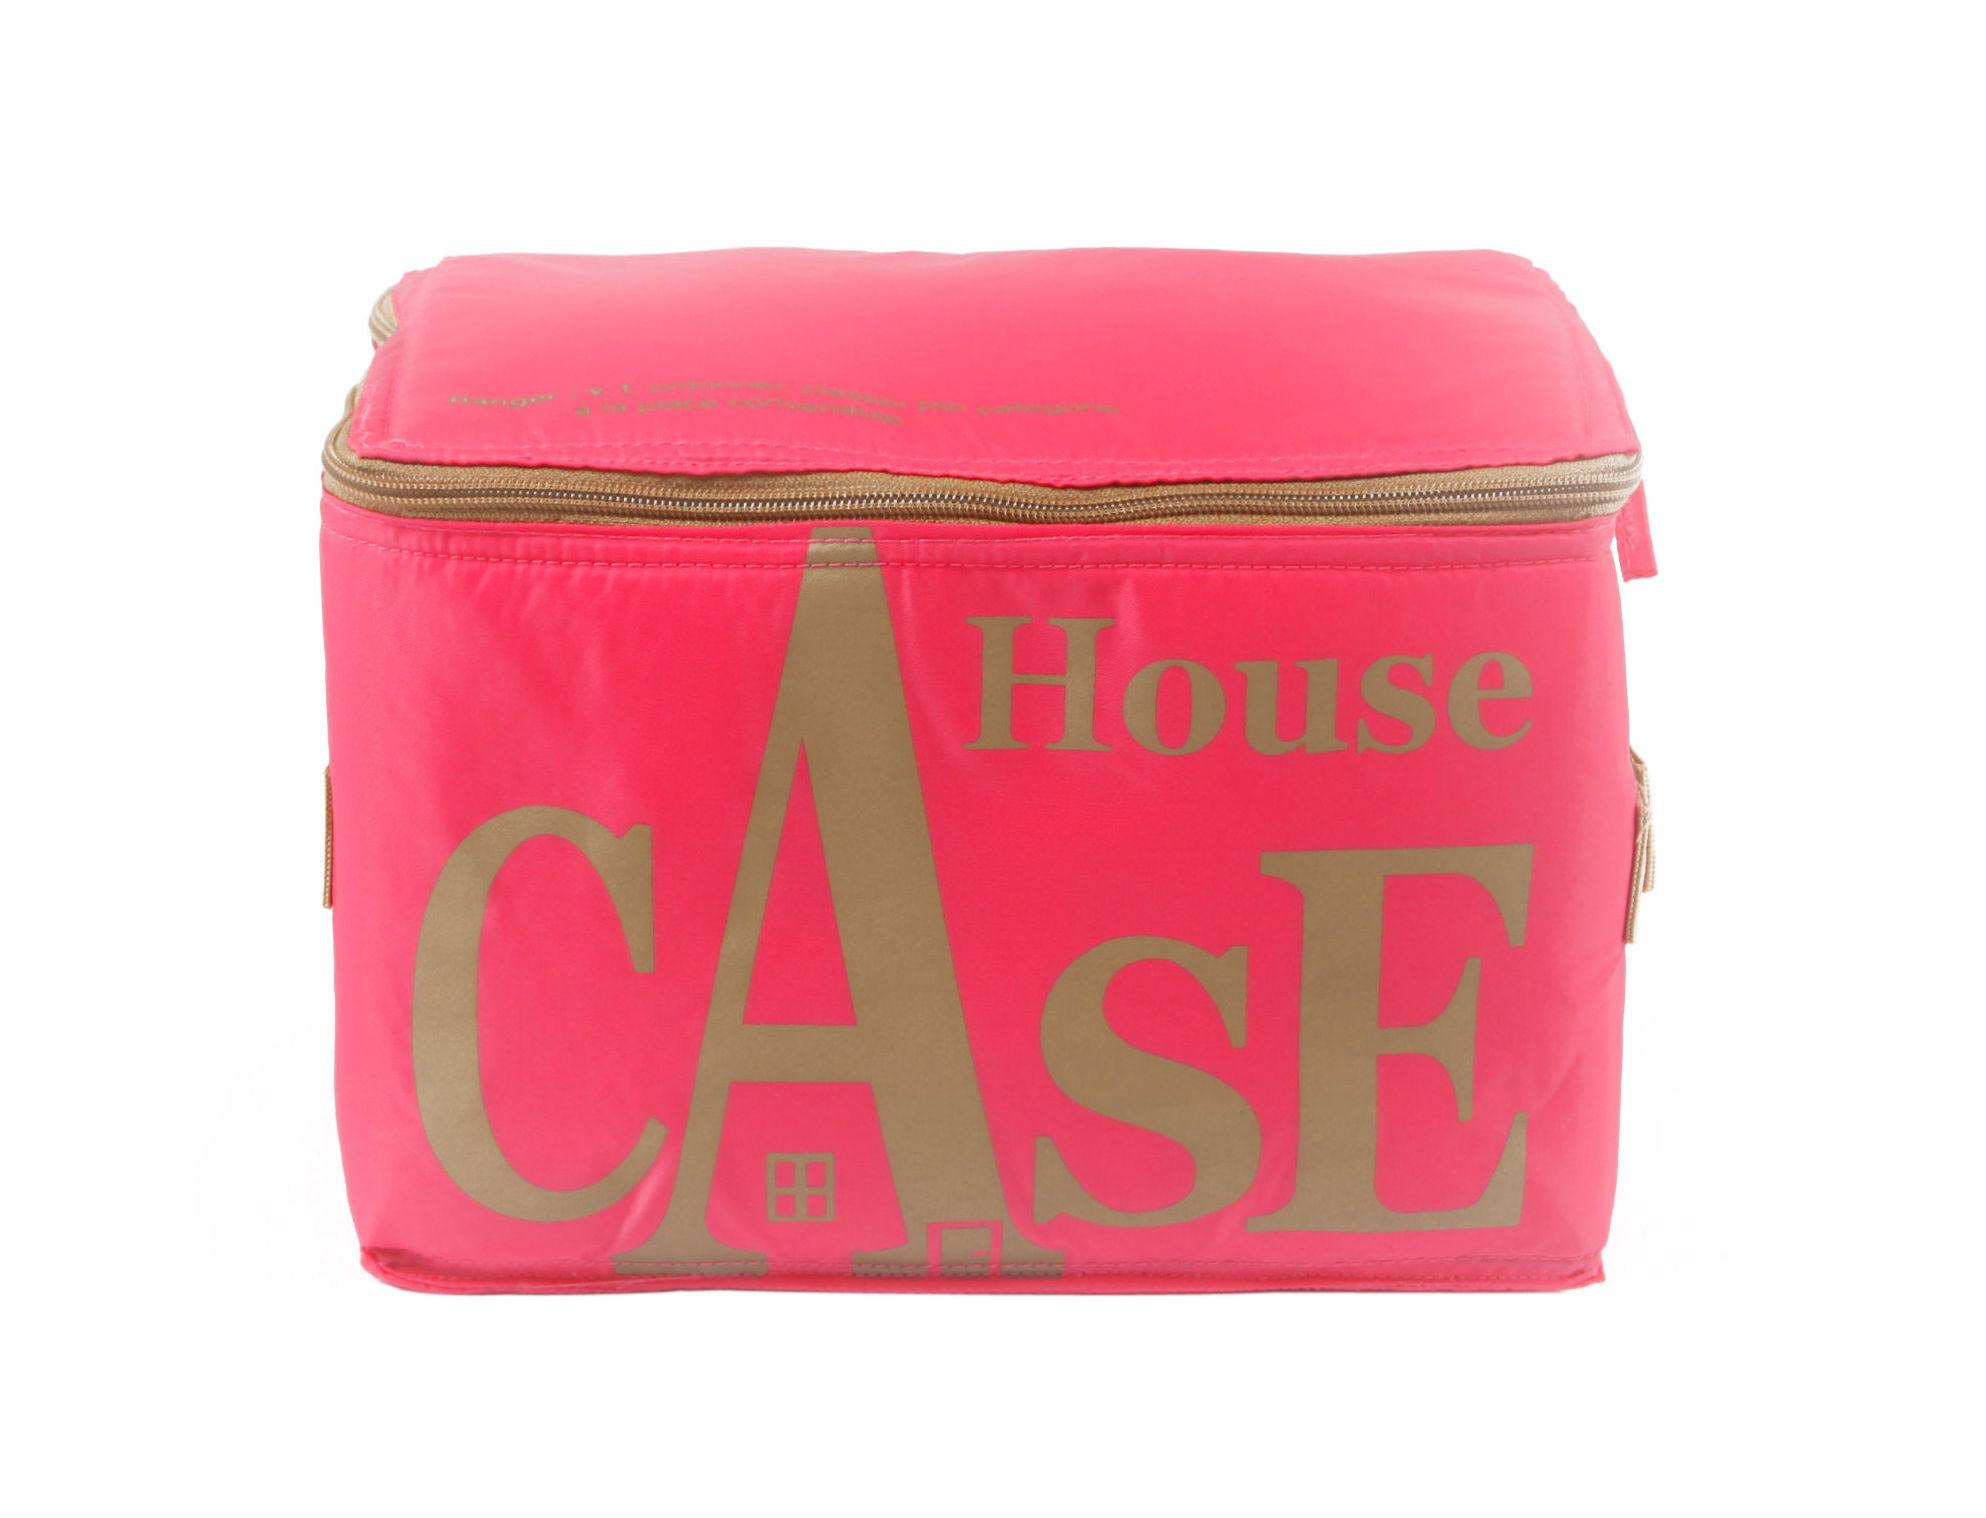 house case storage pink by bensimon. Black Bedroom Furniture Sets. Home Design Ideas